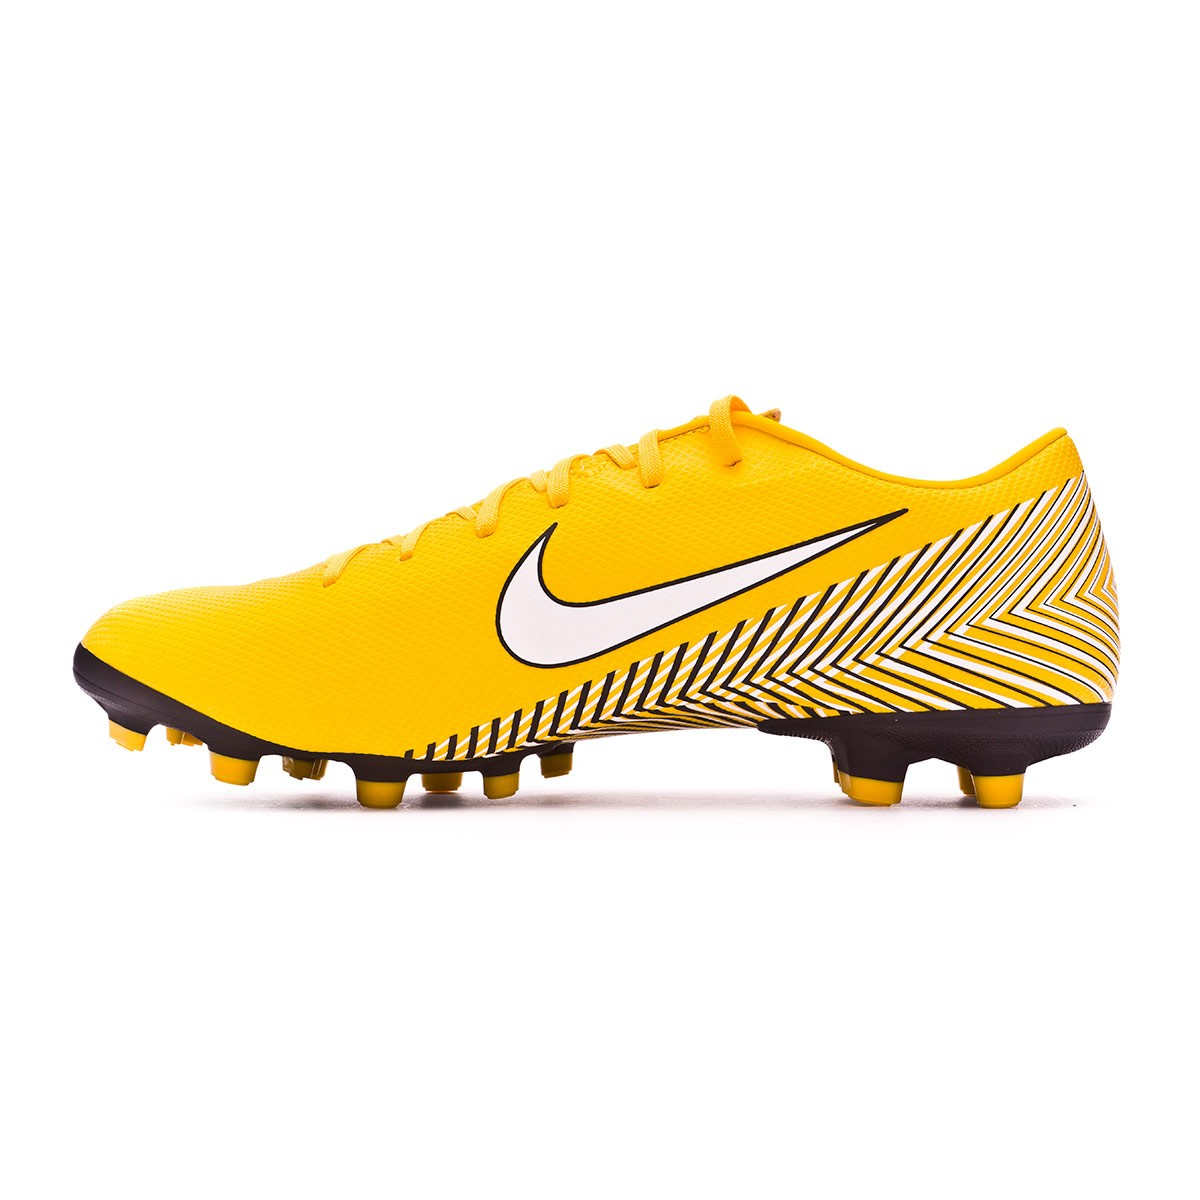 0be5407ce Football Boots Nike Mercurial Vapor XII Academy MG Neymar Yellow-Black -  Football store Fútbol Emotion